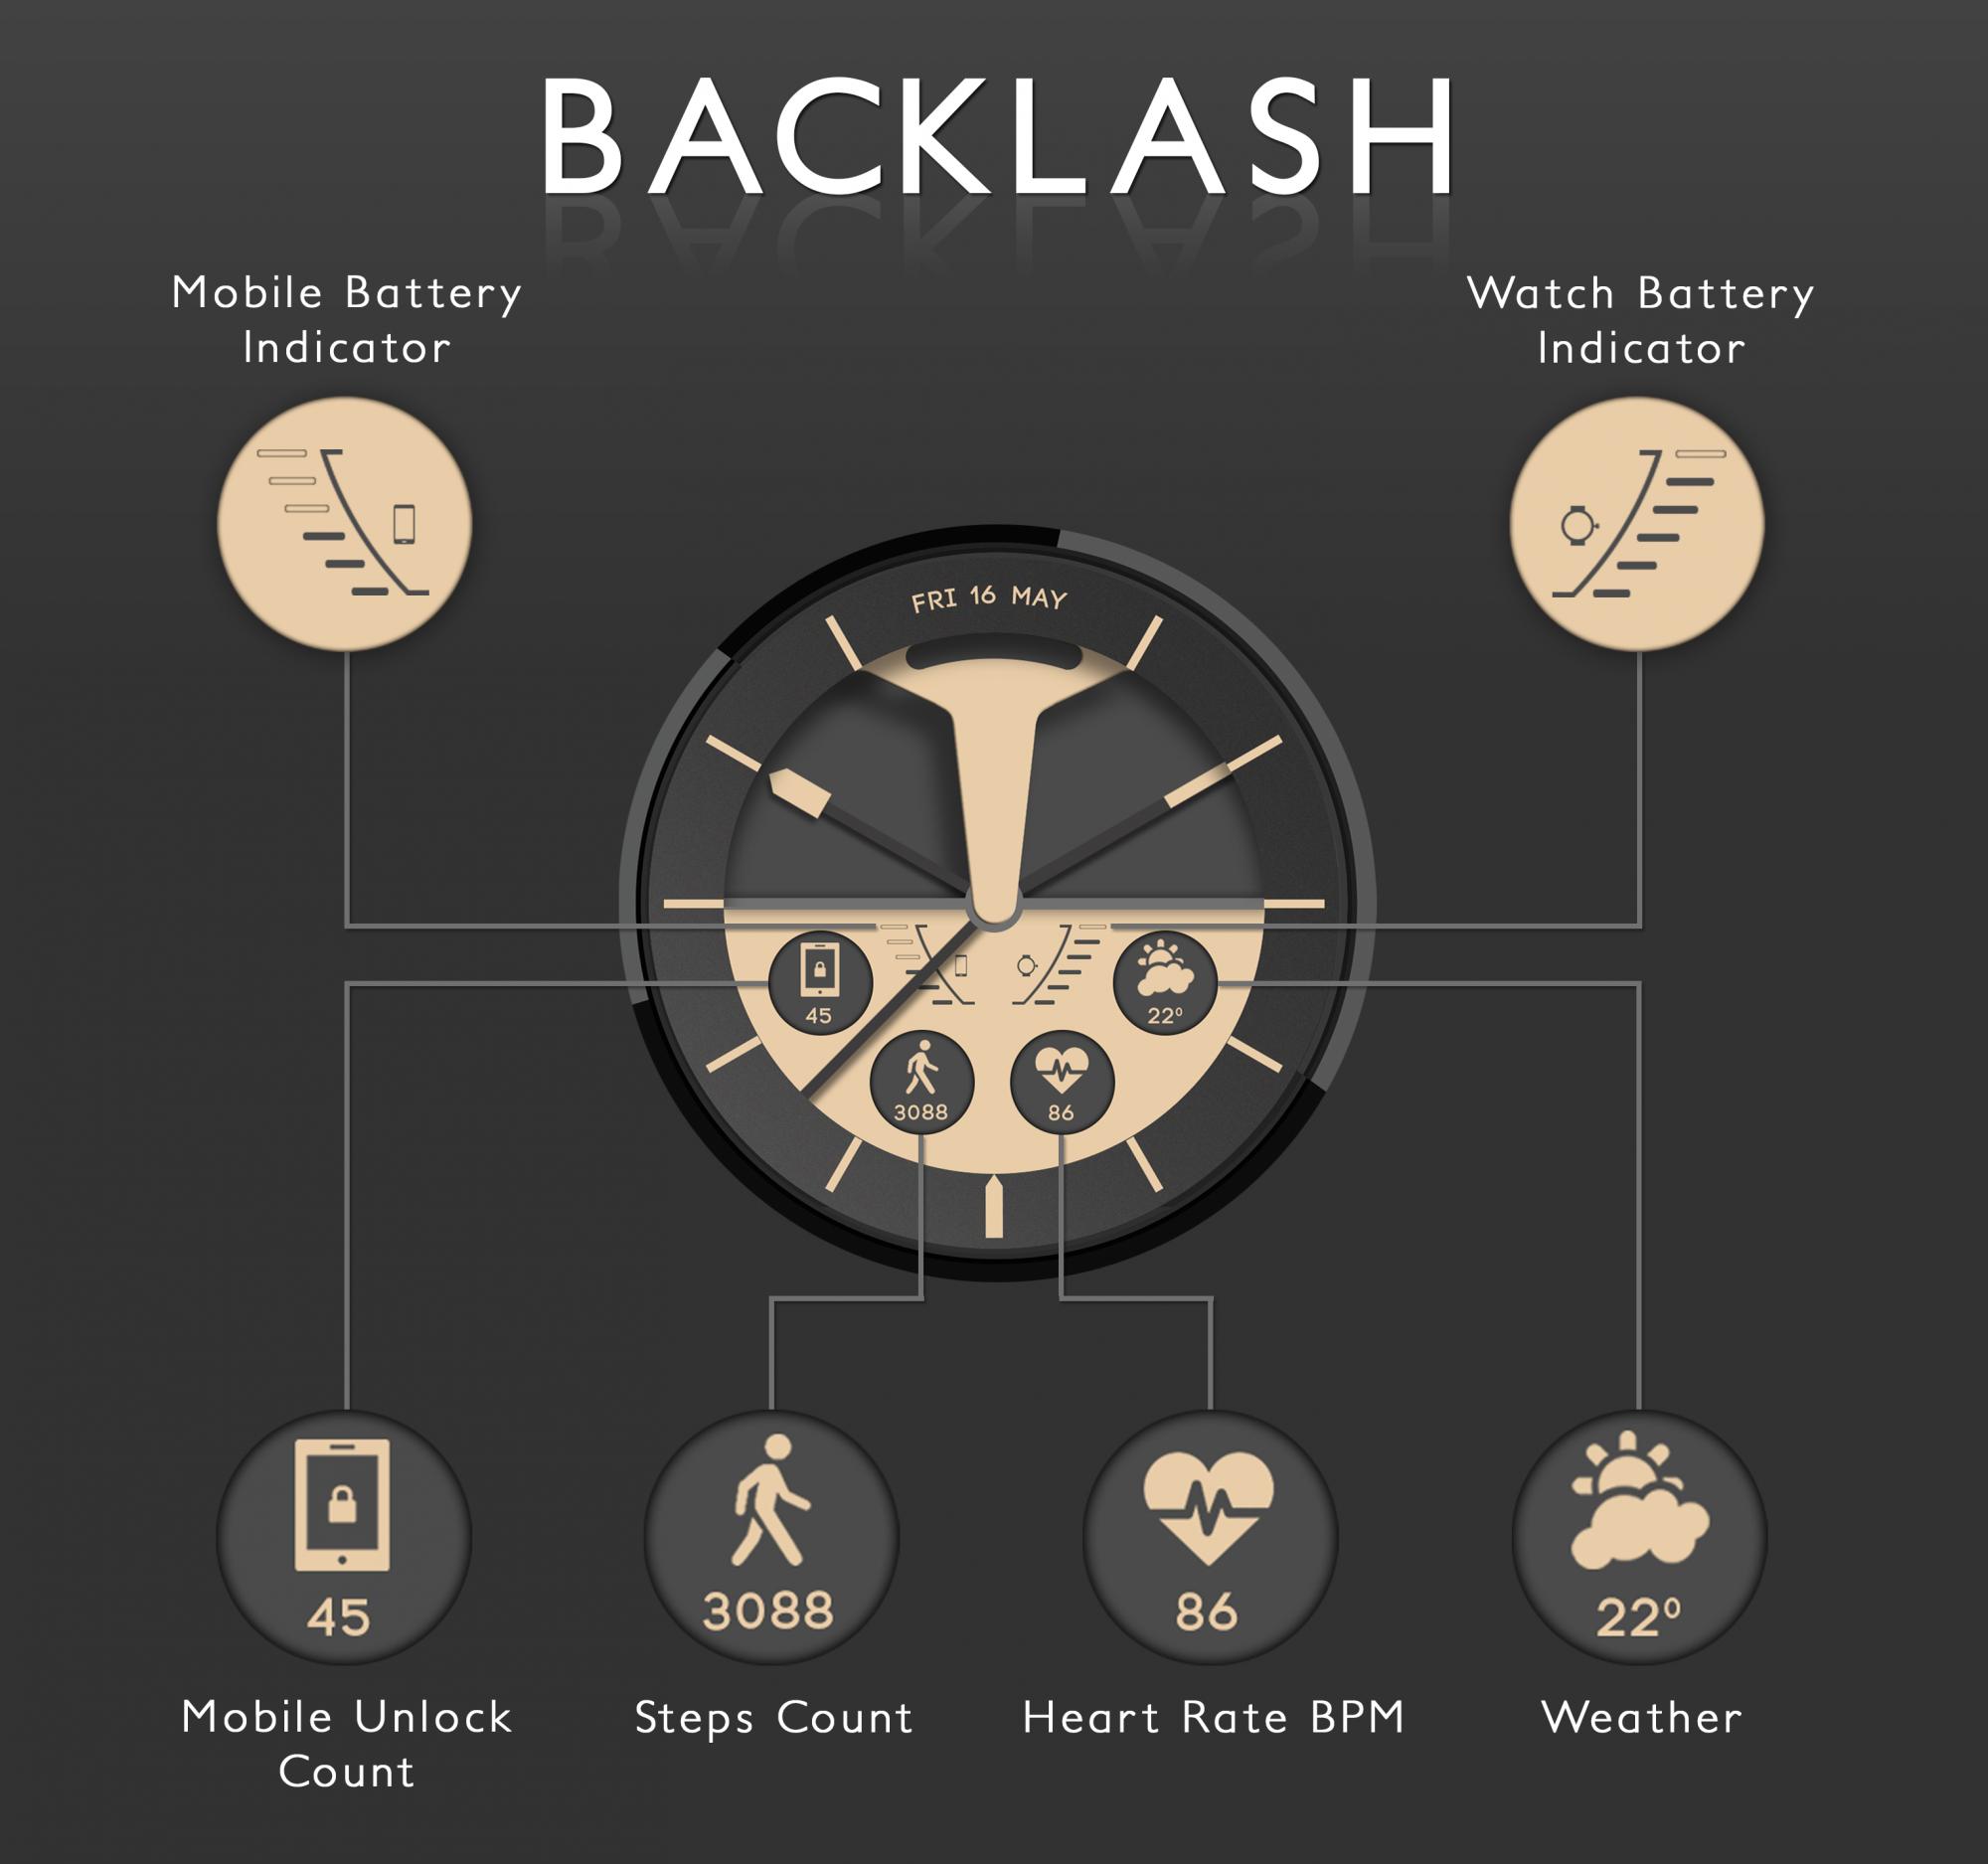 backlash_info_3048X2858.png